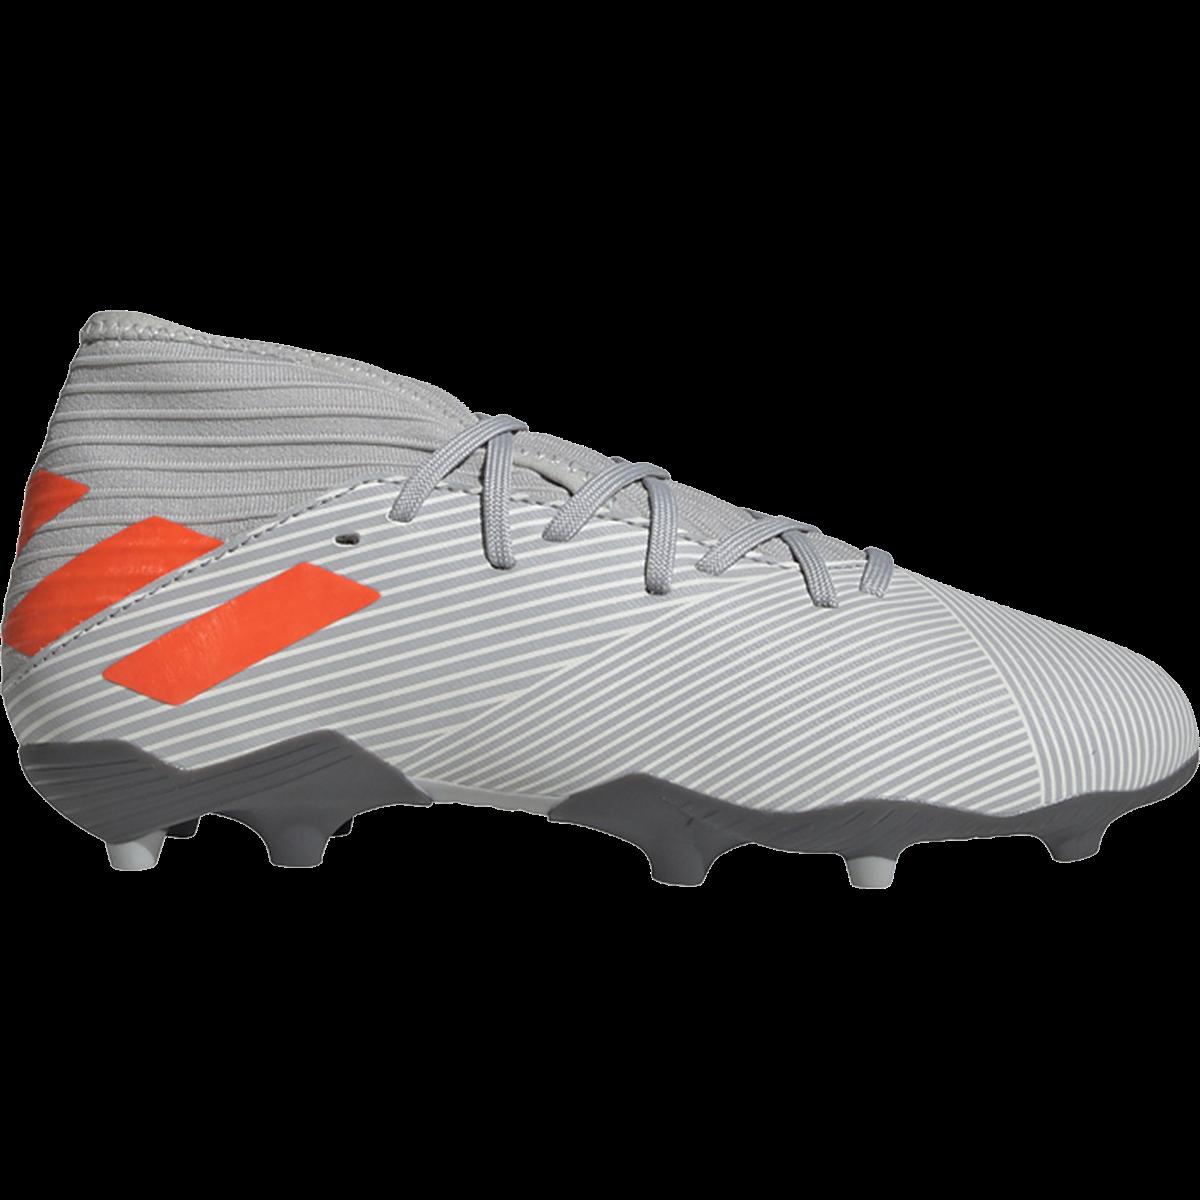 adidas Nemeziz 19.3 FG Fußballschuhe Grau / Solarorange / Kreideweiß-1.5   – Products